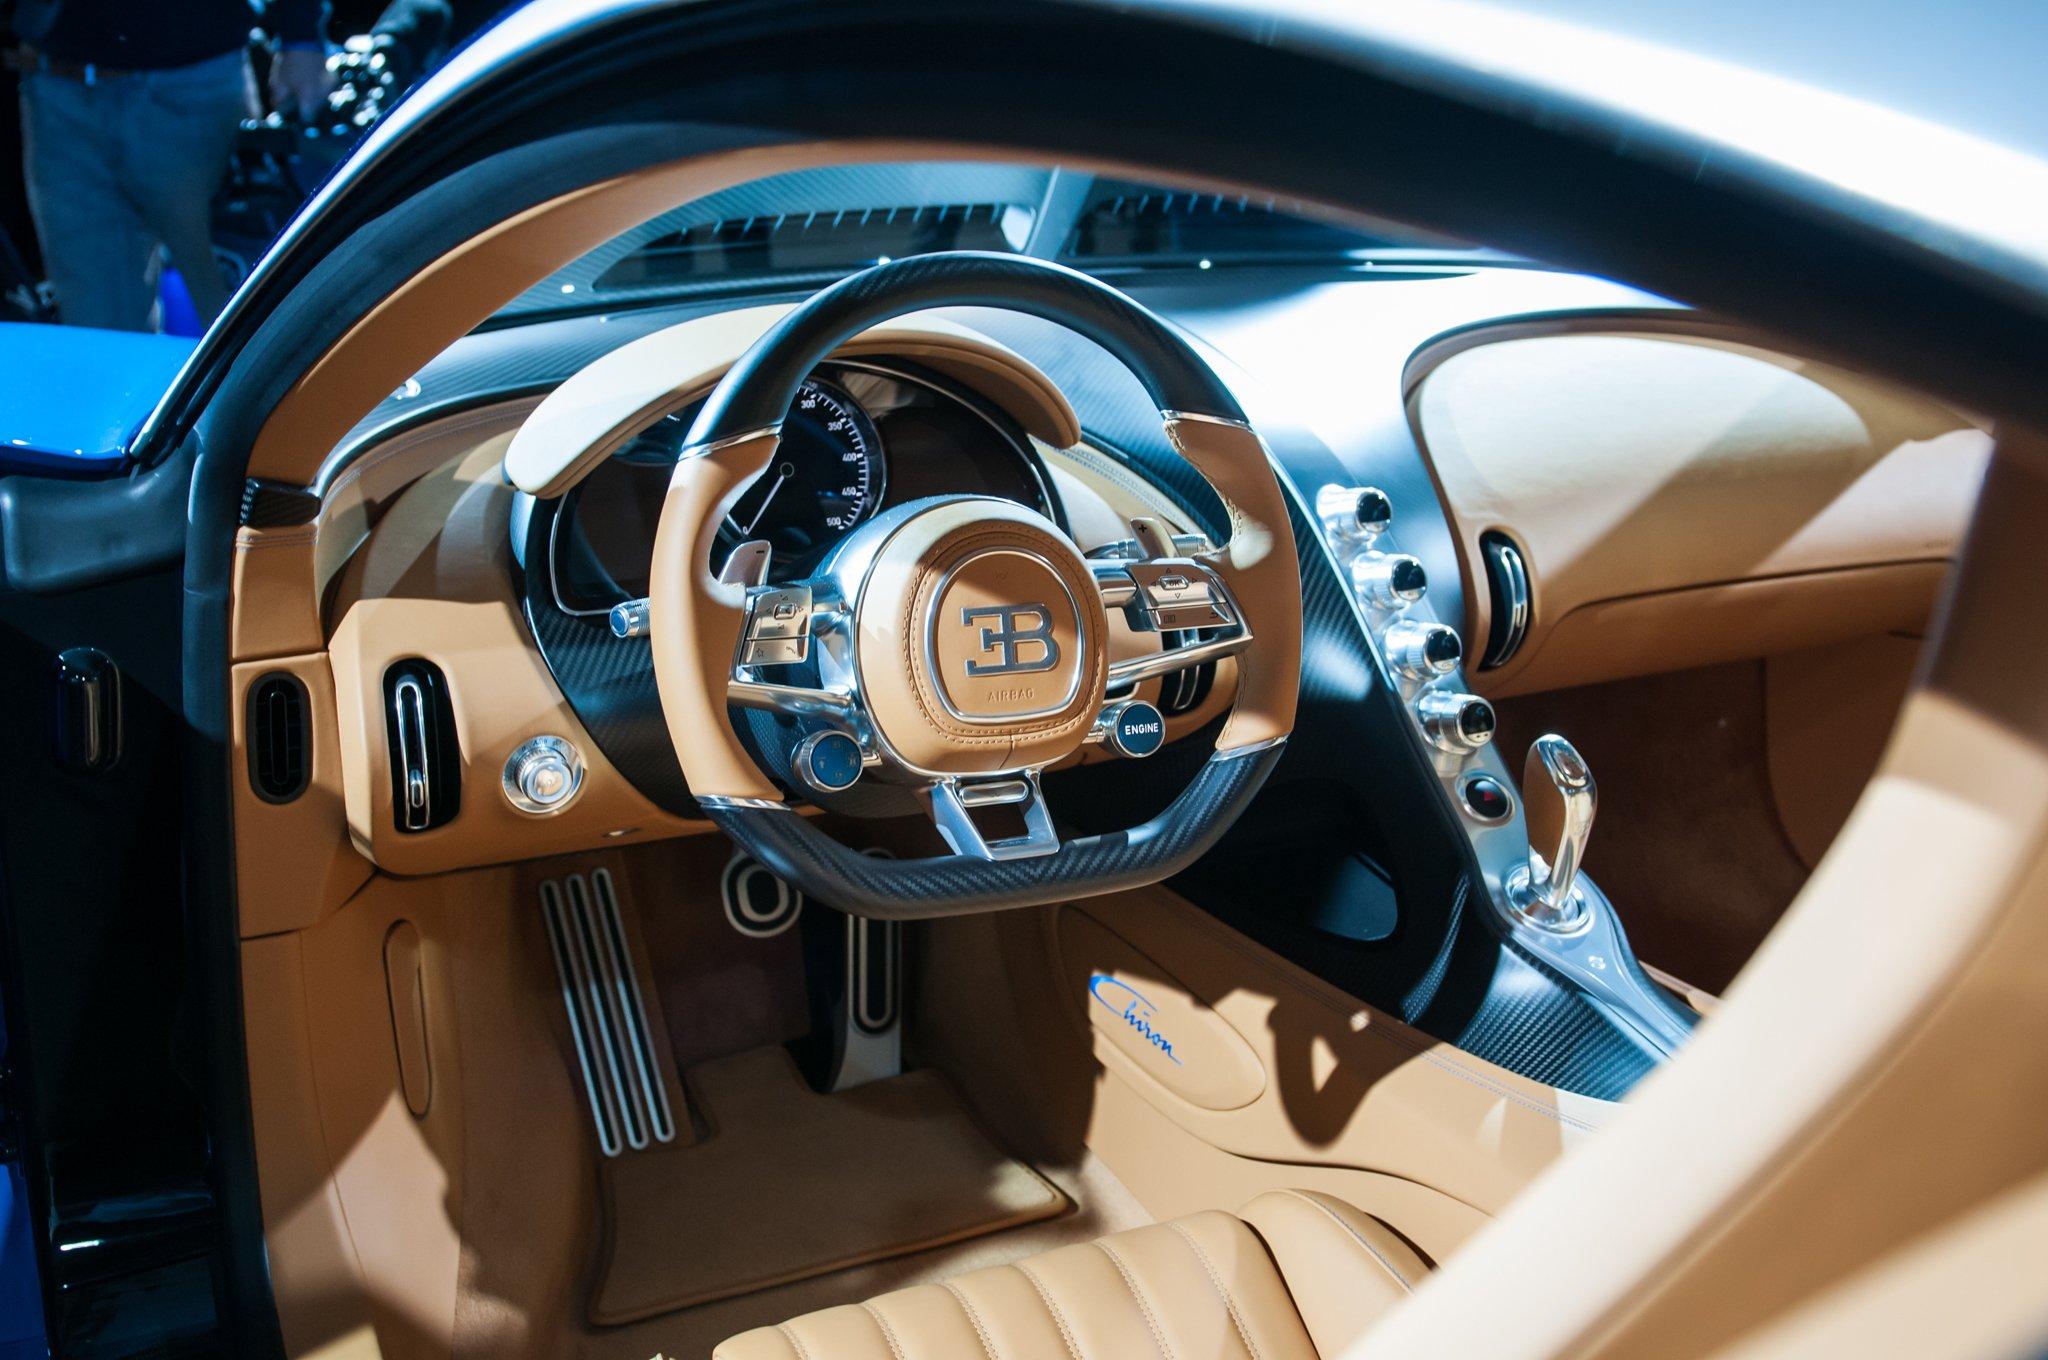 Bugatti and Parmigiani work together to Produce the Bugatti ...